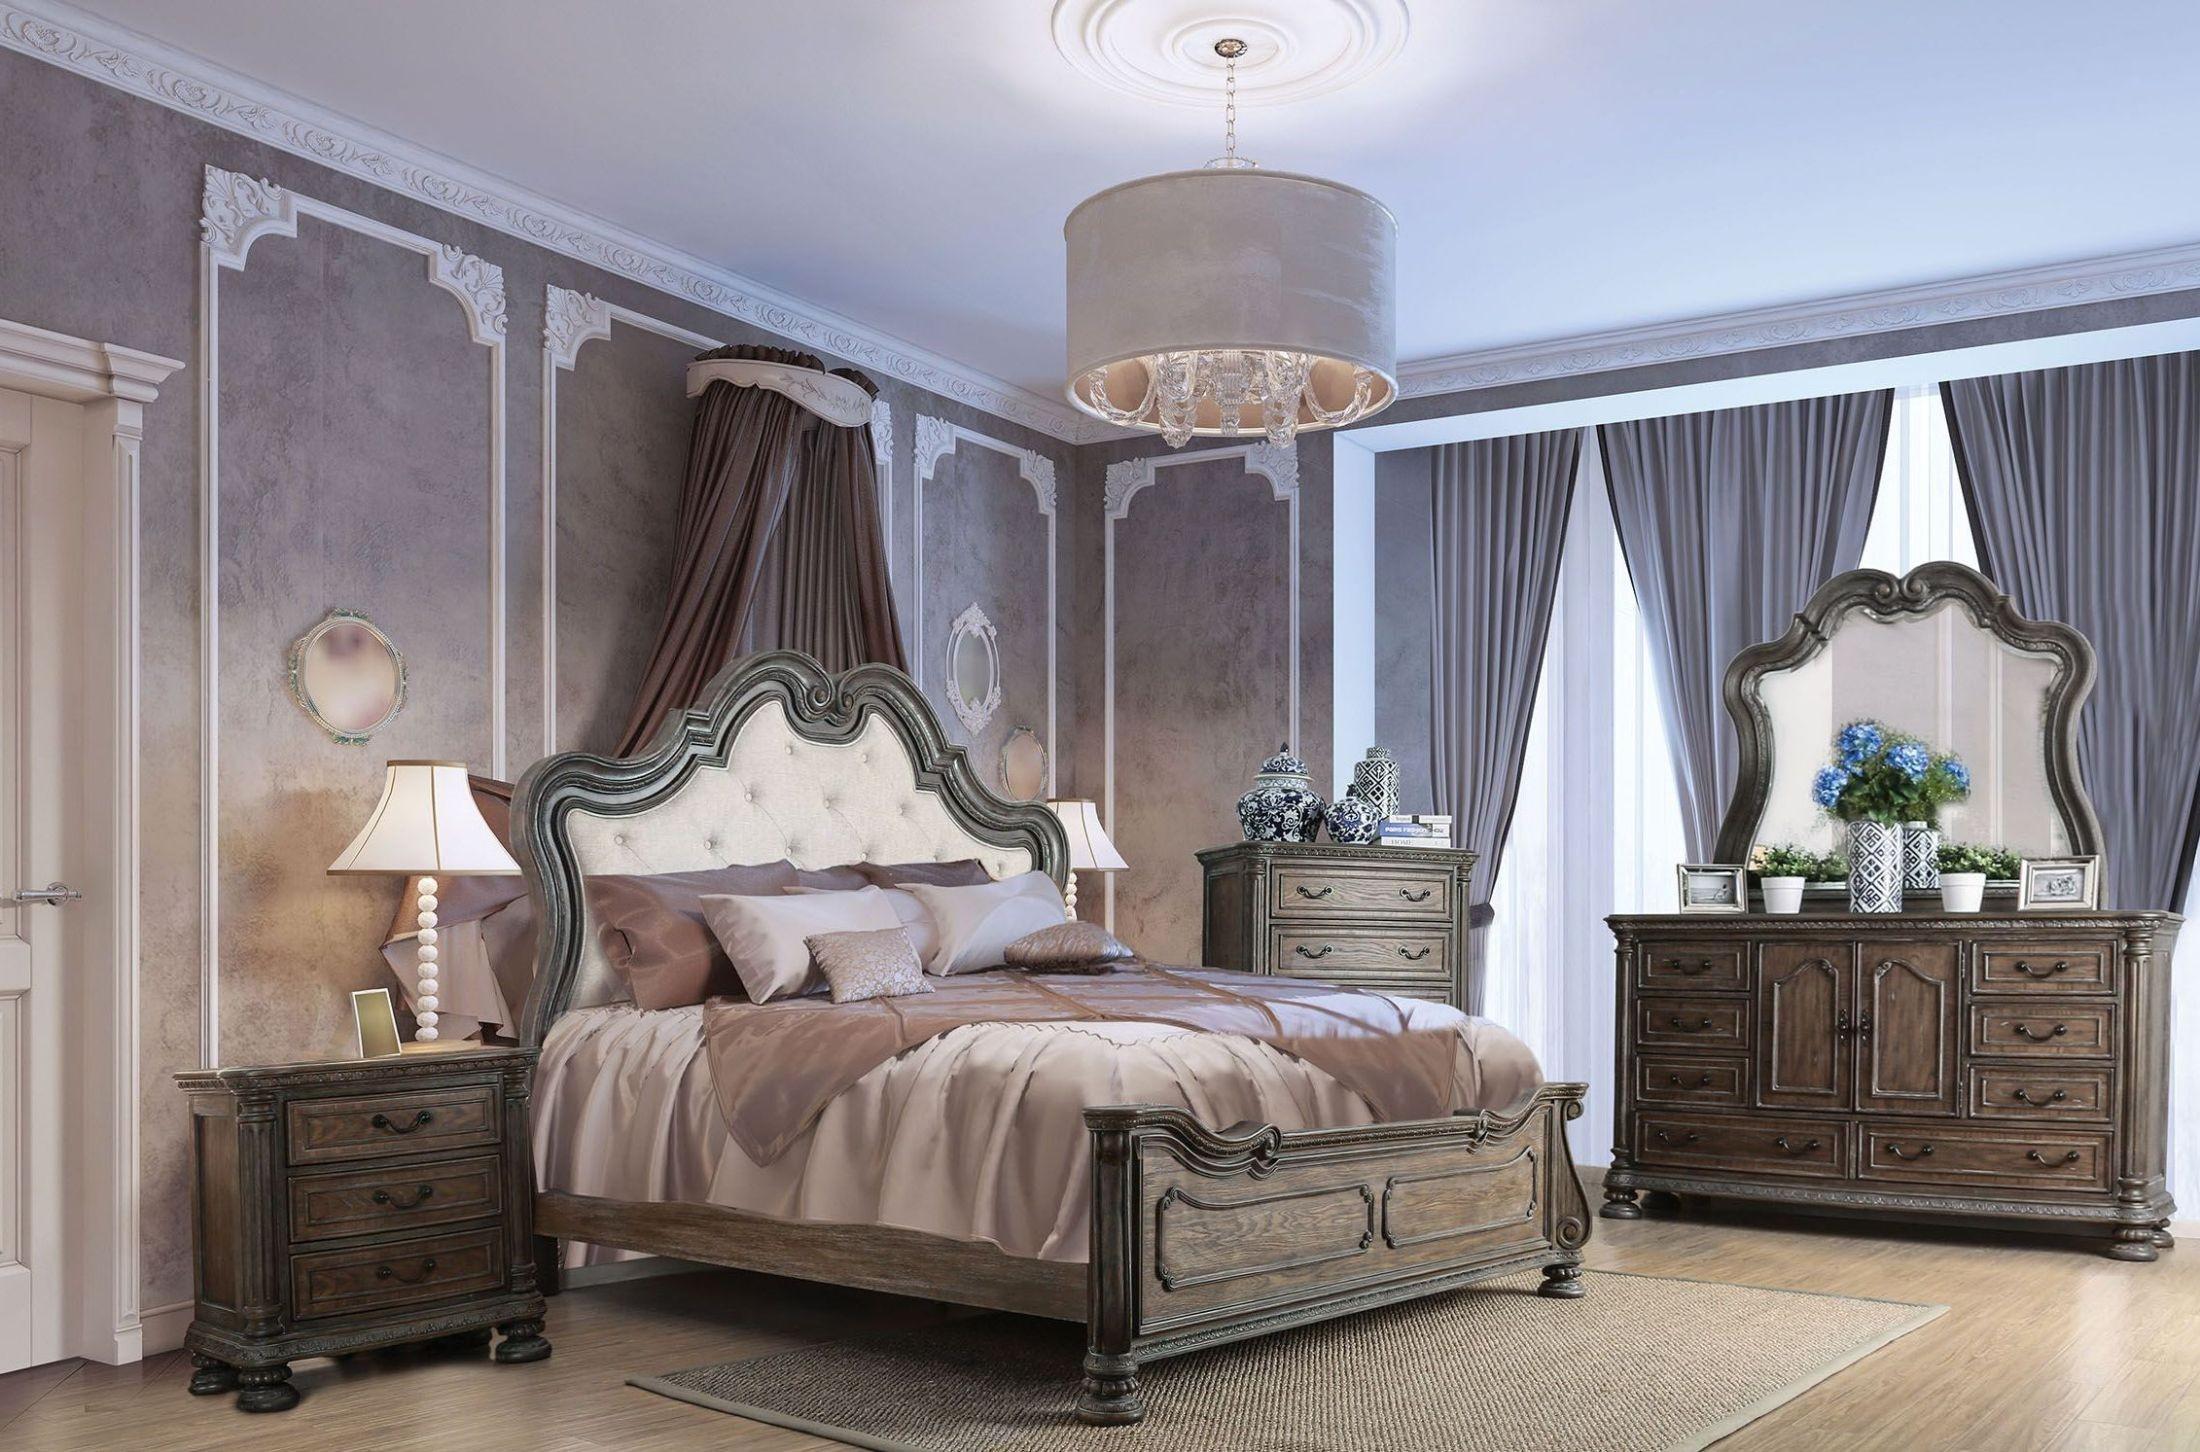 ariadne rustic natural tone upholstered panel bedroom set